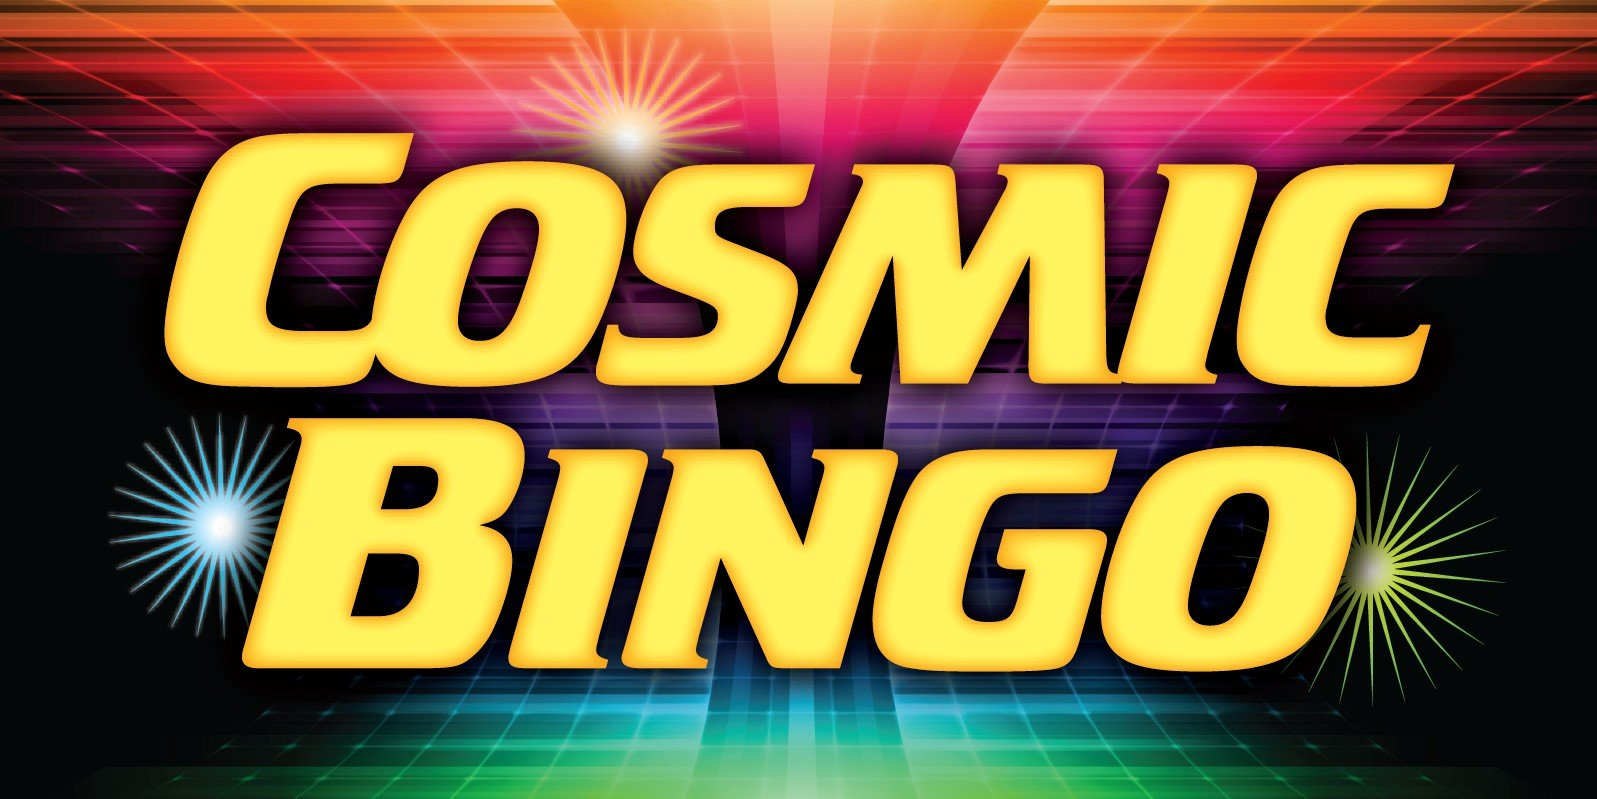 Cosmic Bingo-December '15 Image